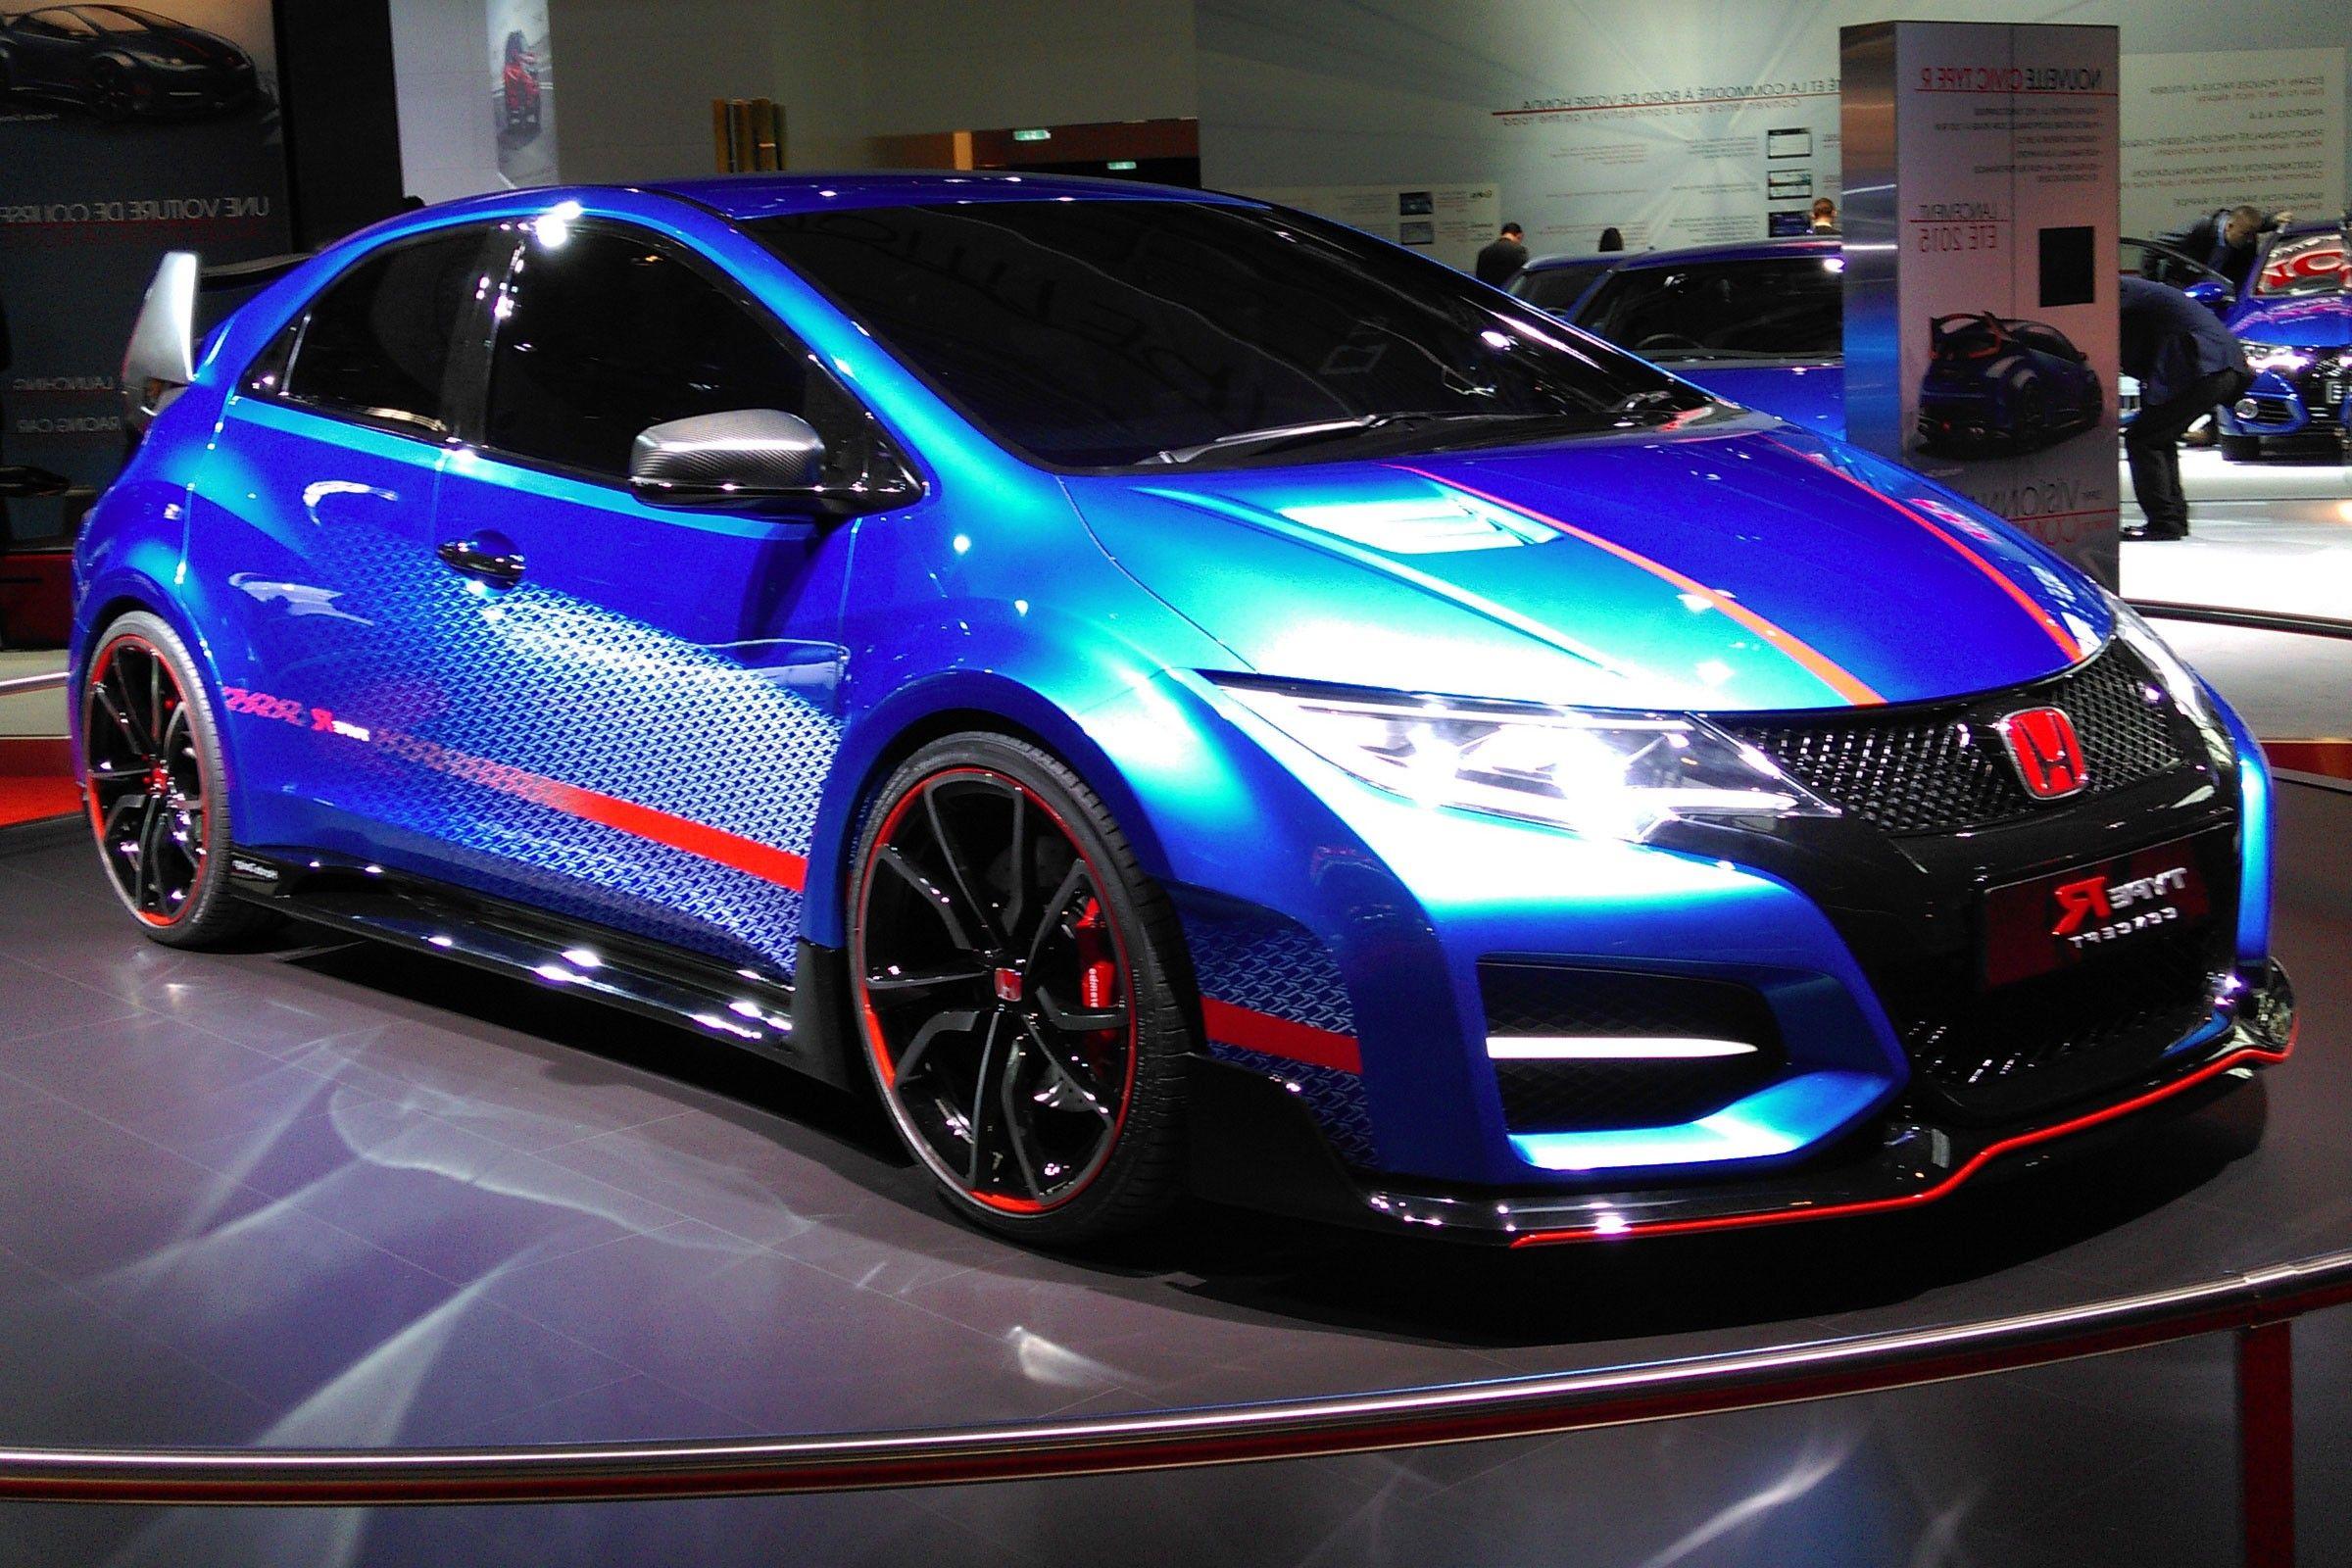 Pin by future concept car on 2018 honda civic type r wallpaper pinterest honda civic honda and car engine